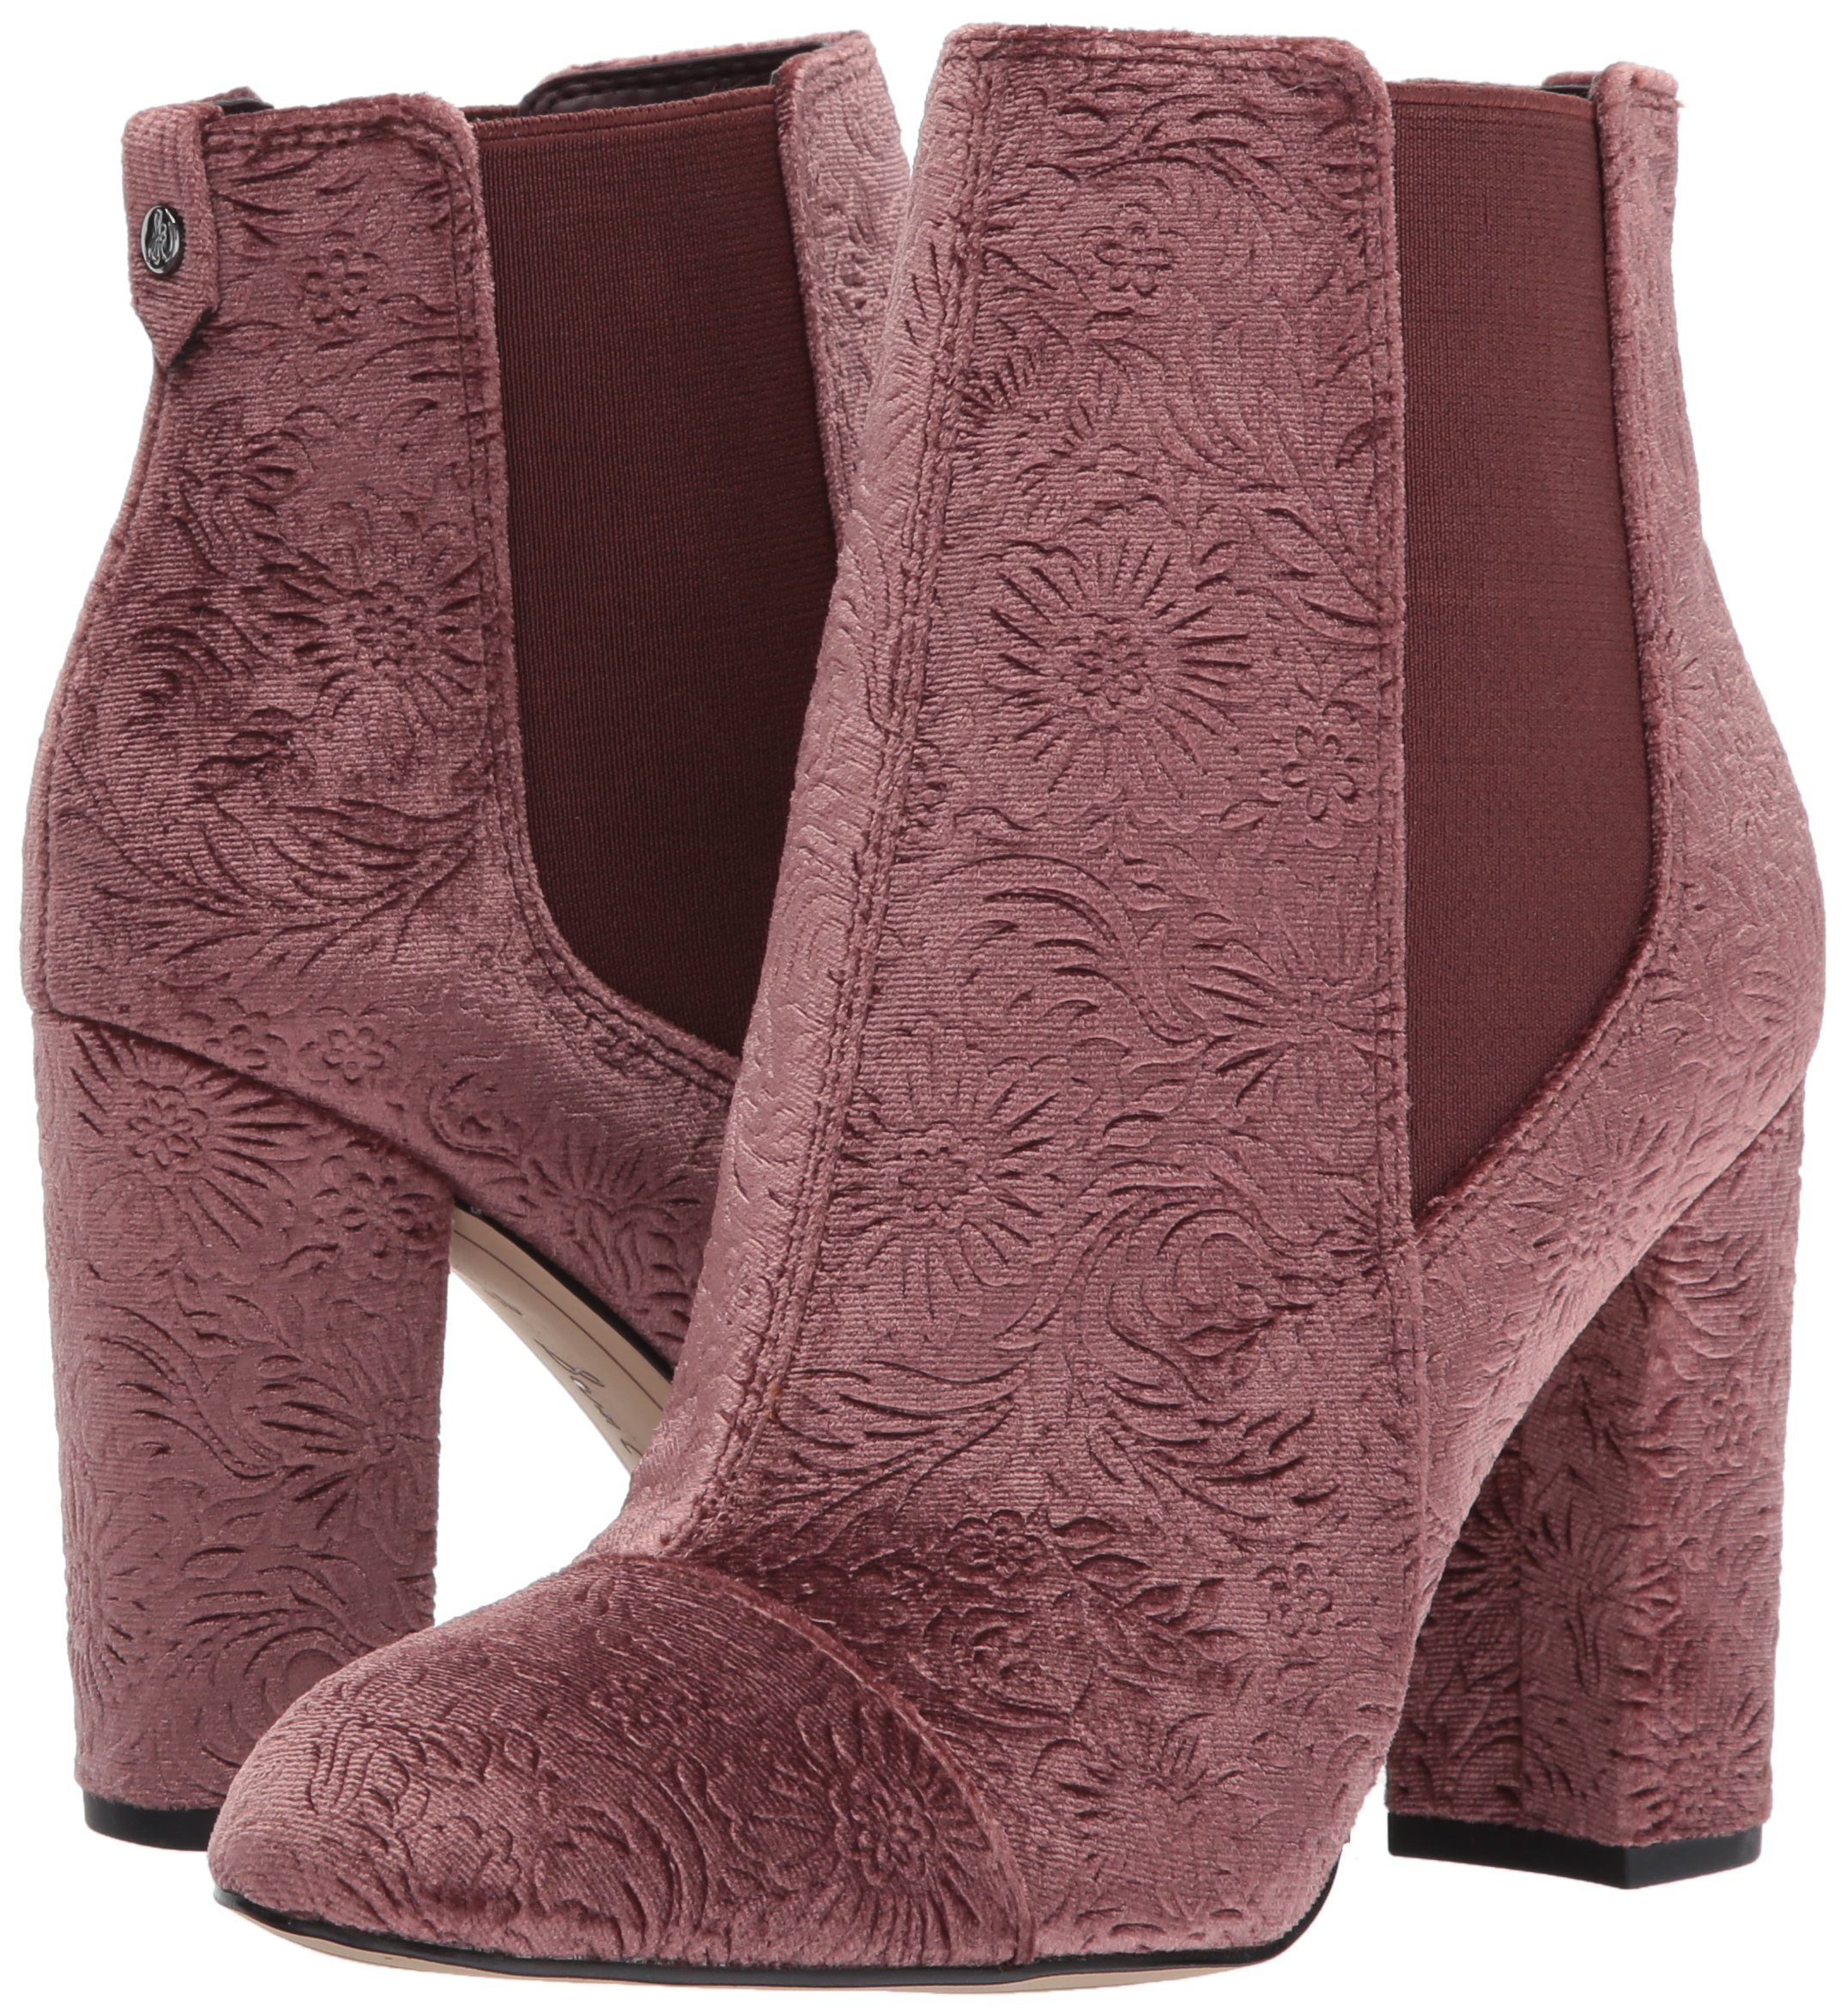 Sam Edelman F3619F1 Womens Case Chelsea Boot Choose SZ//Color.